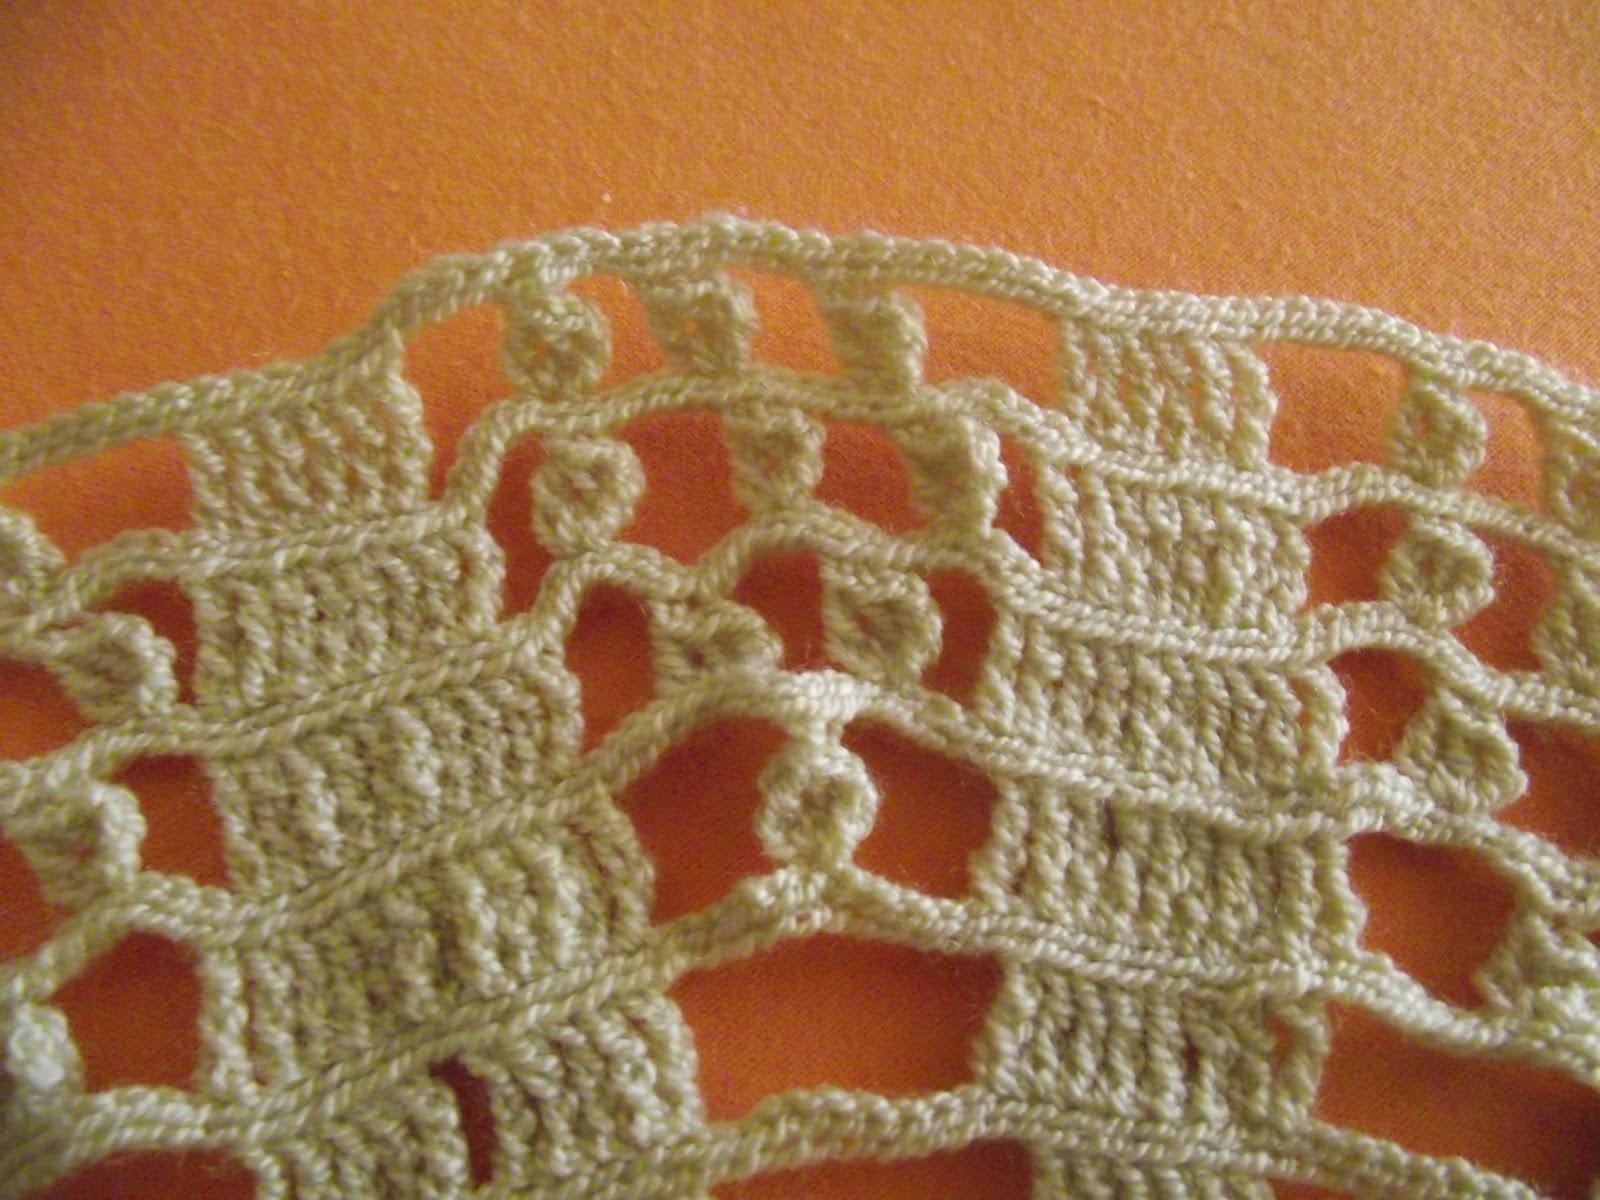 Novedades Paola: Tapete en Crochet Primer Proyecto